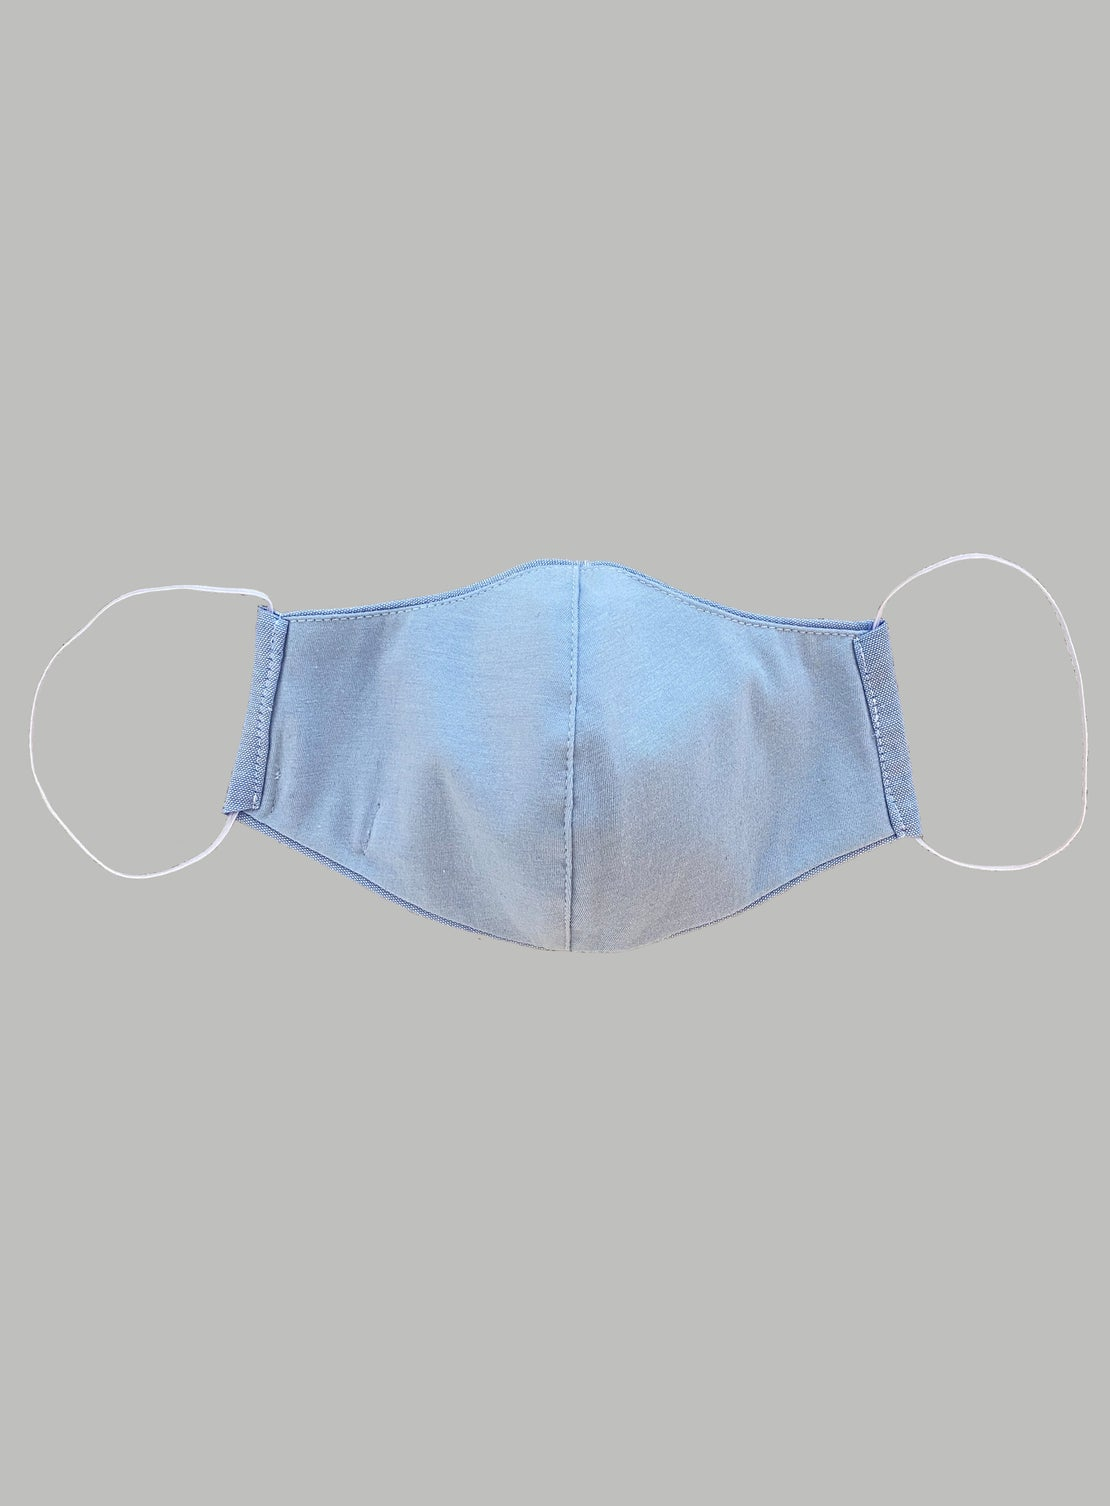 Face Mask - Blue Oxford Cotton